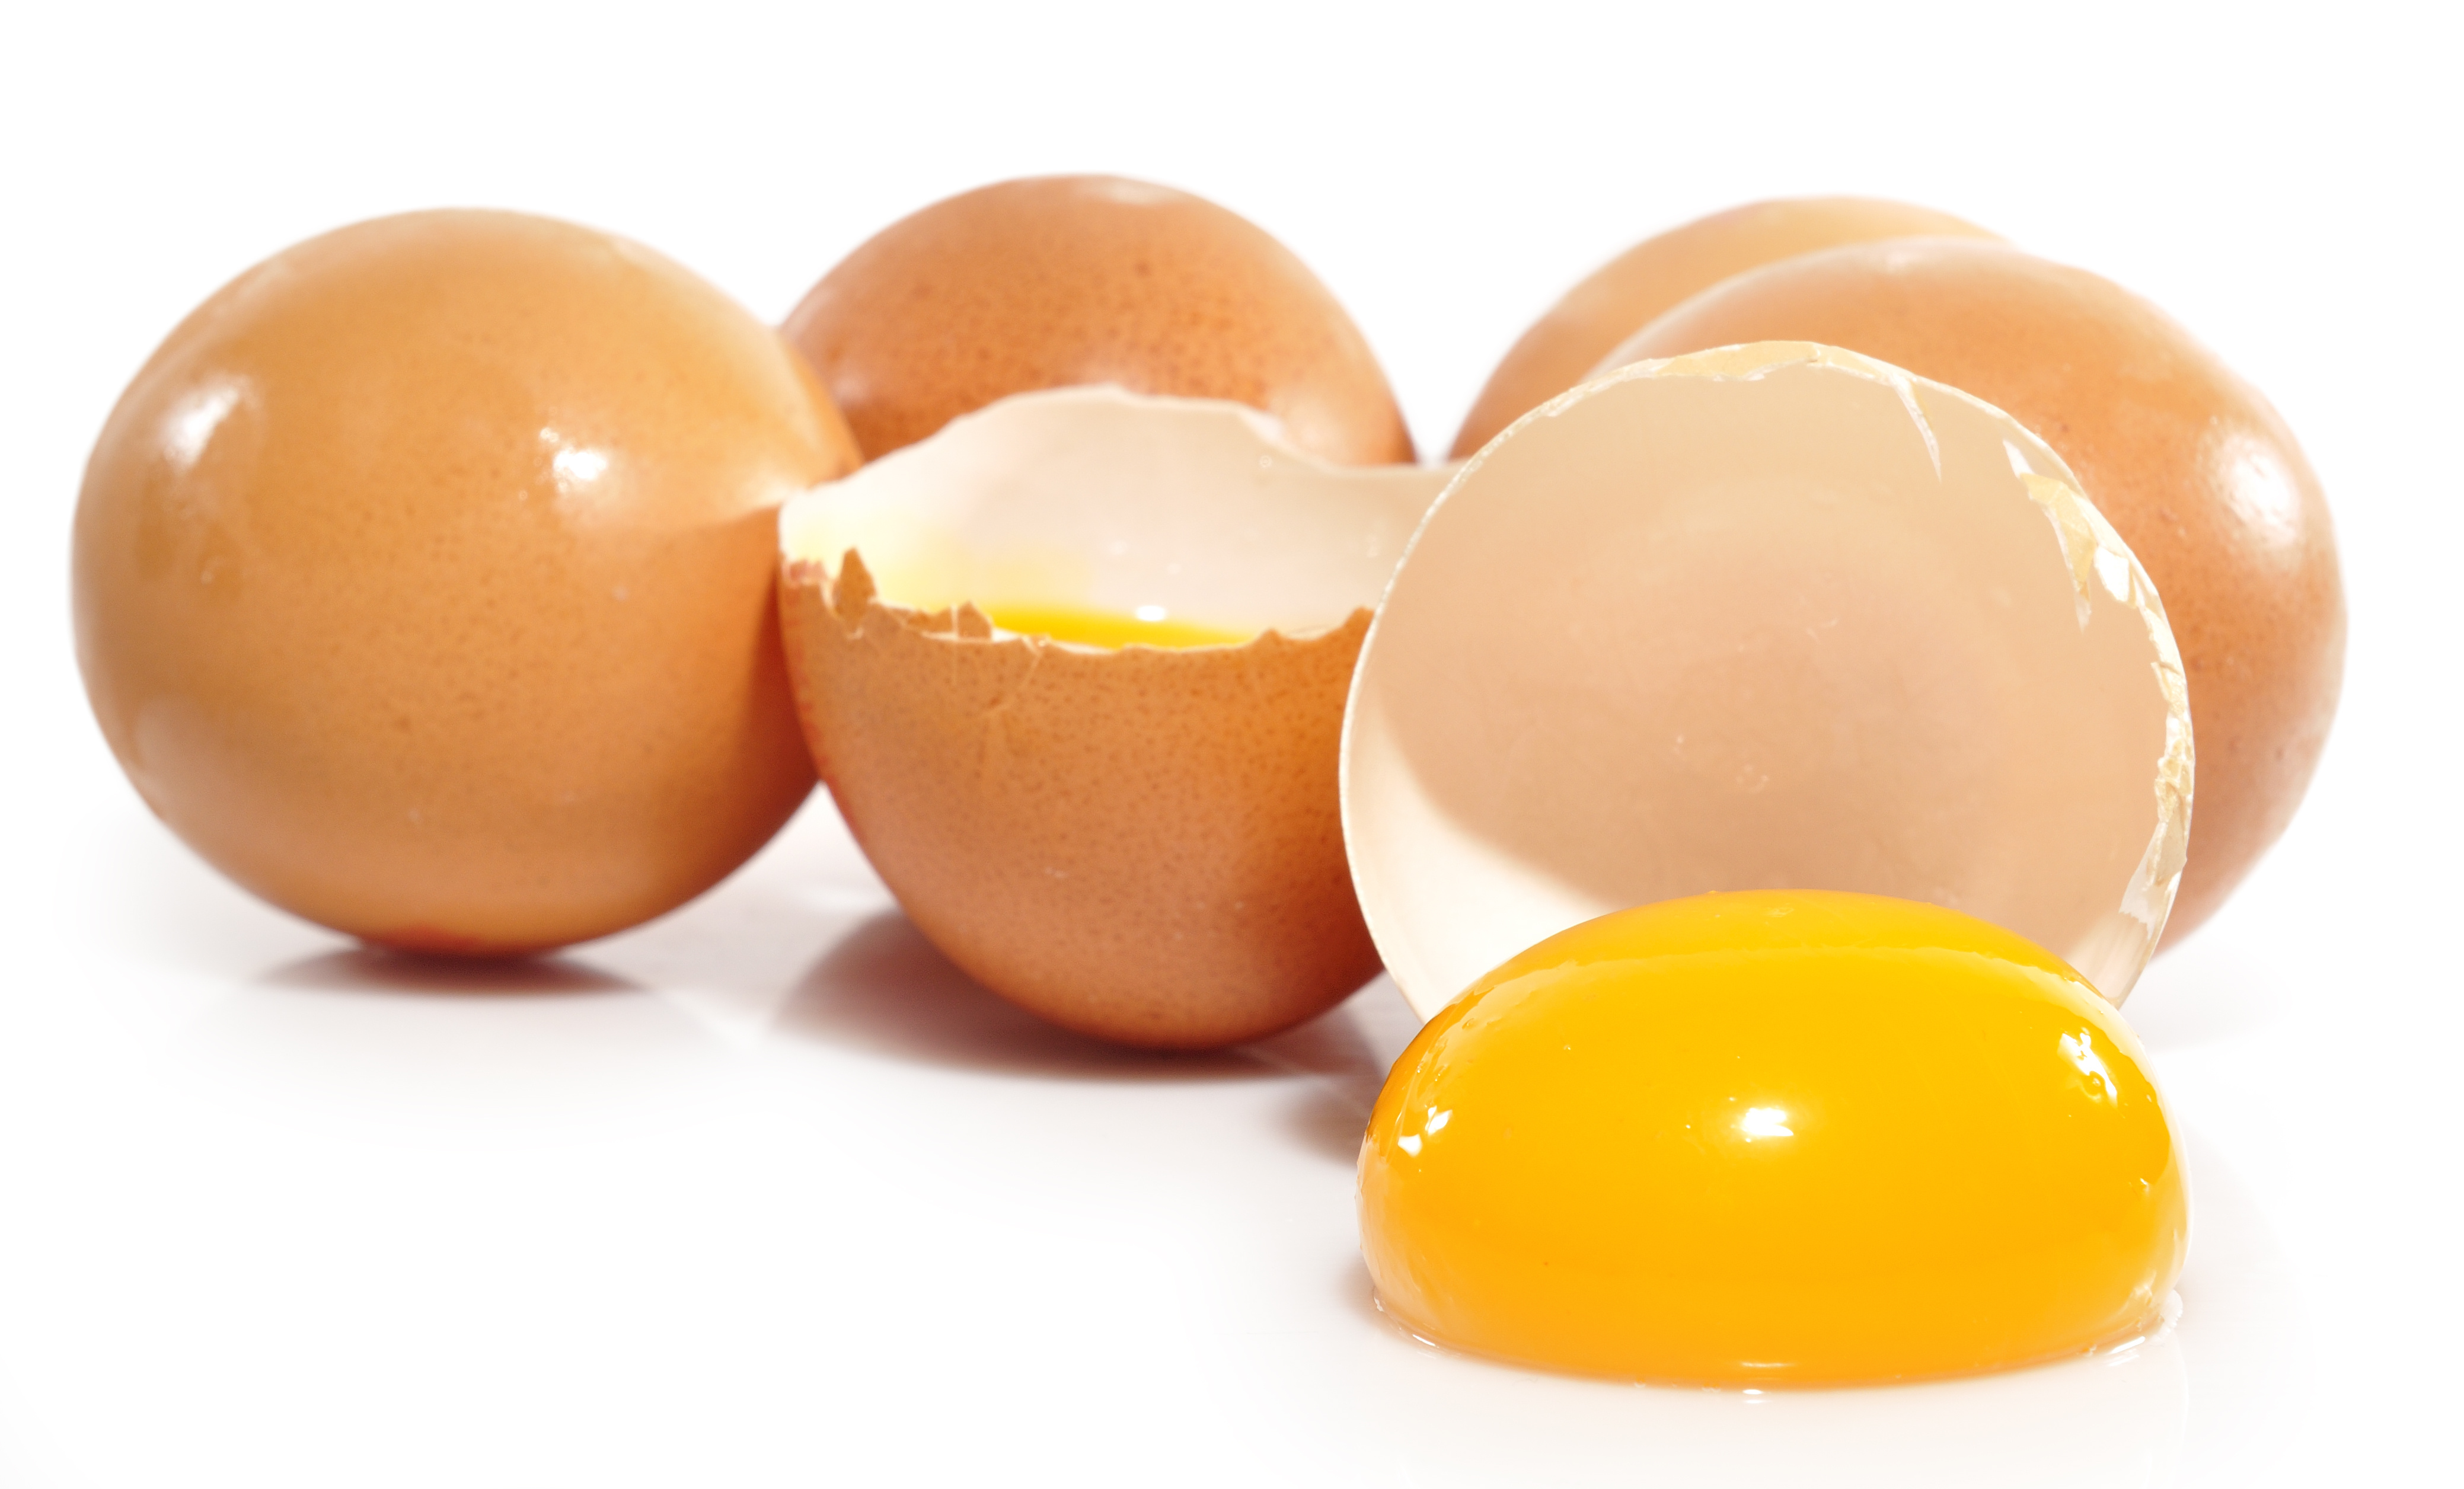 ¡Manda huevos! (contaminados con fipronil) (parte 2)